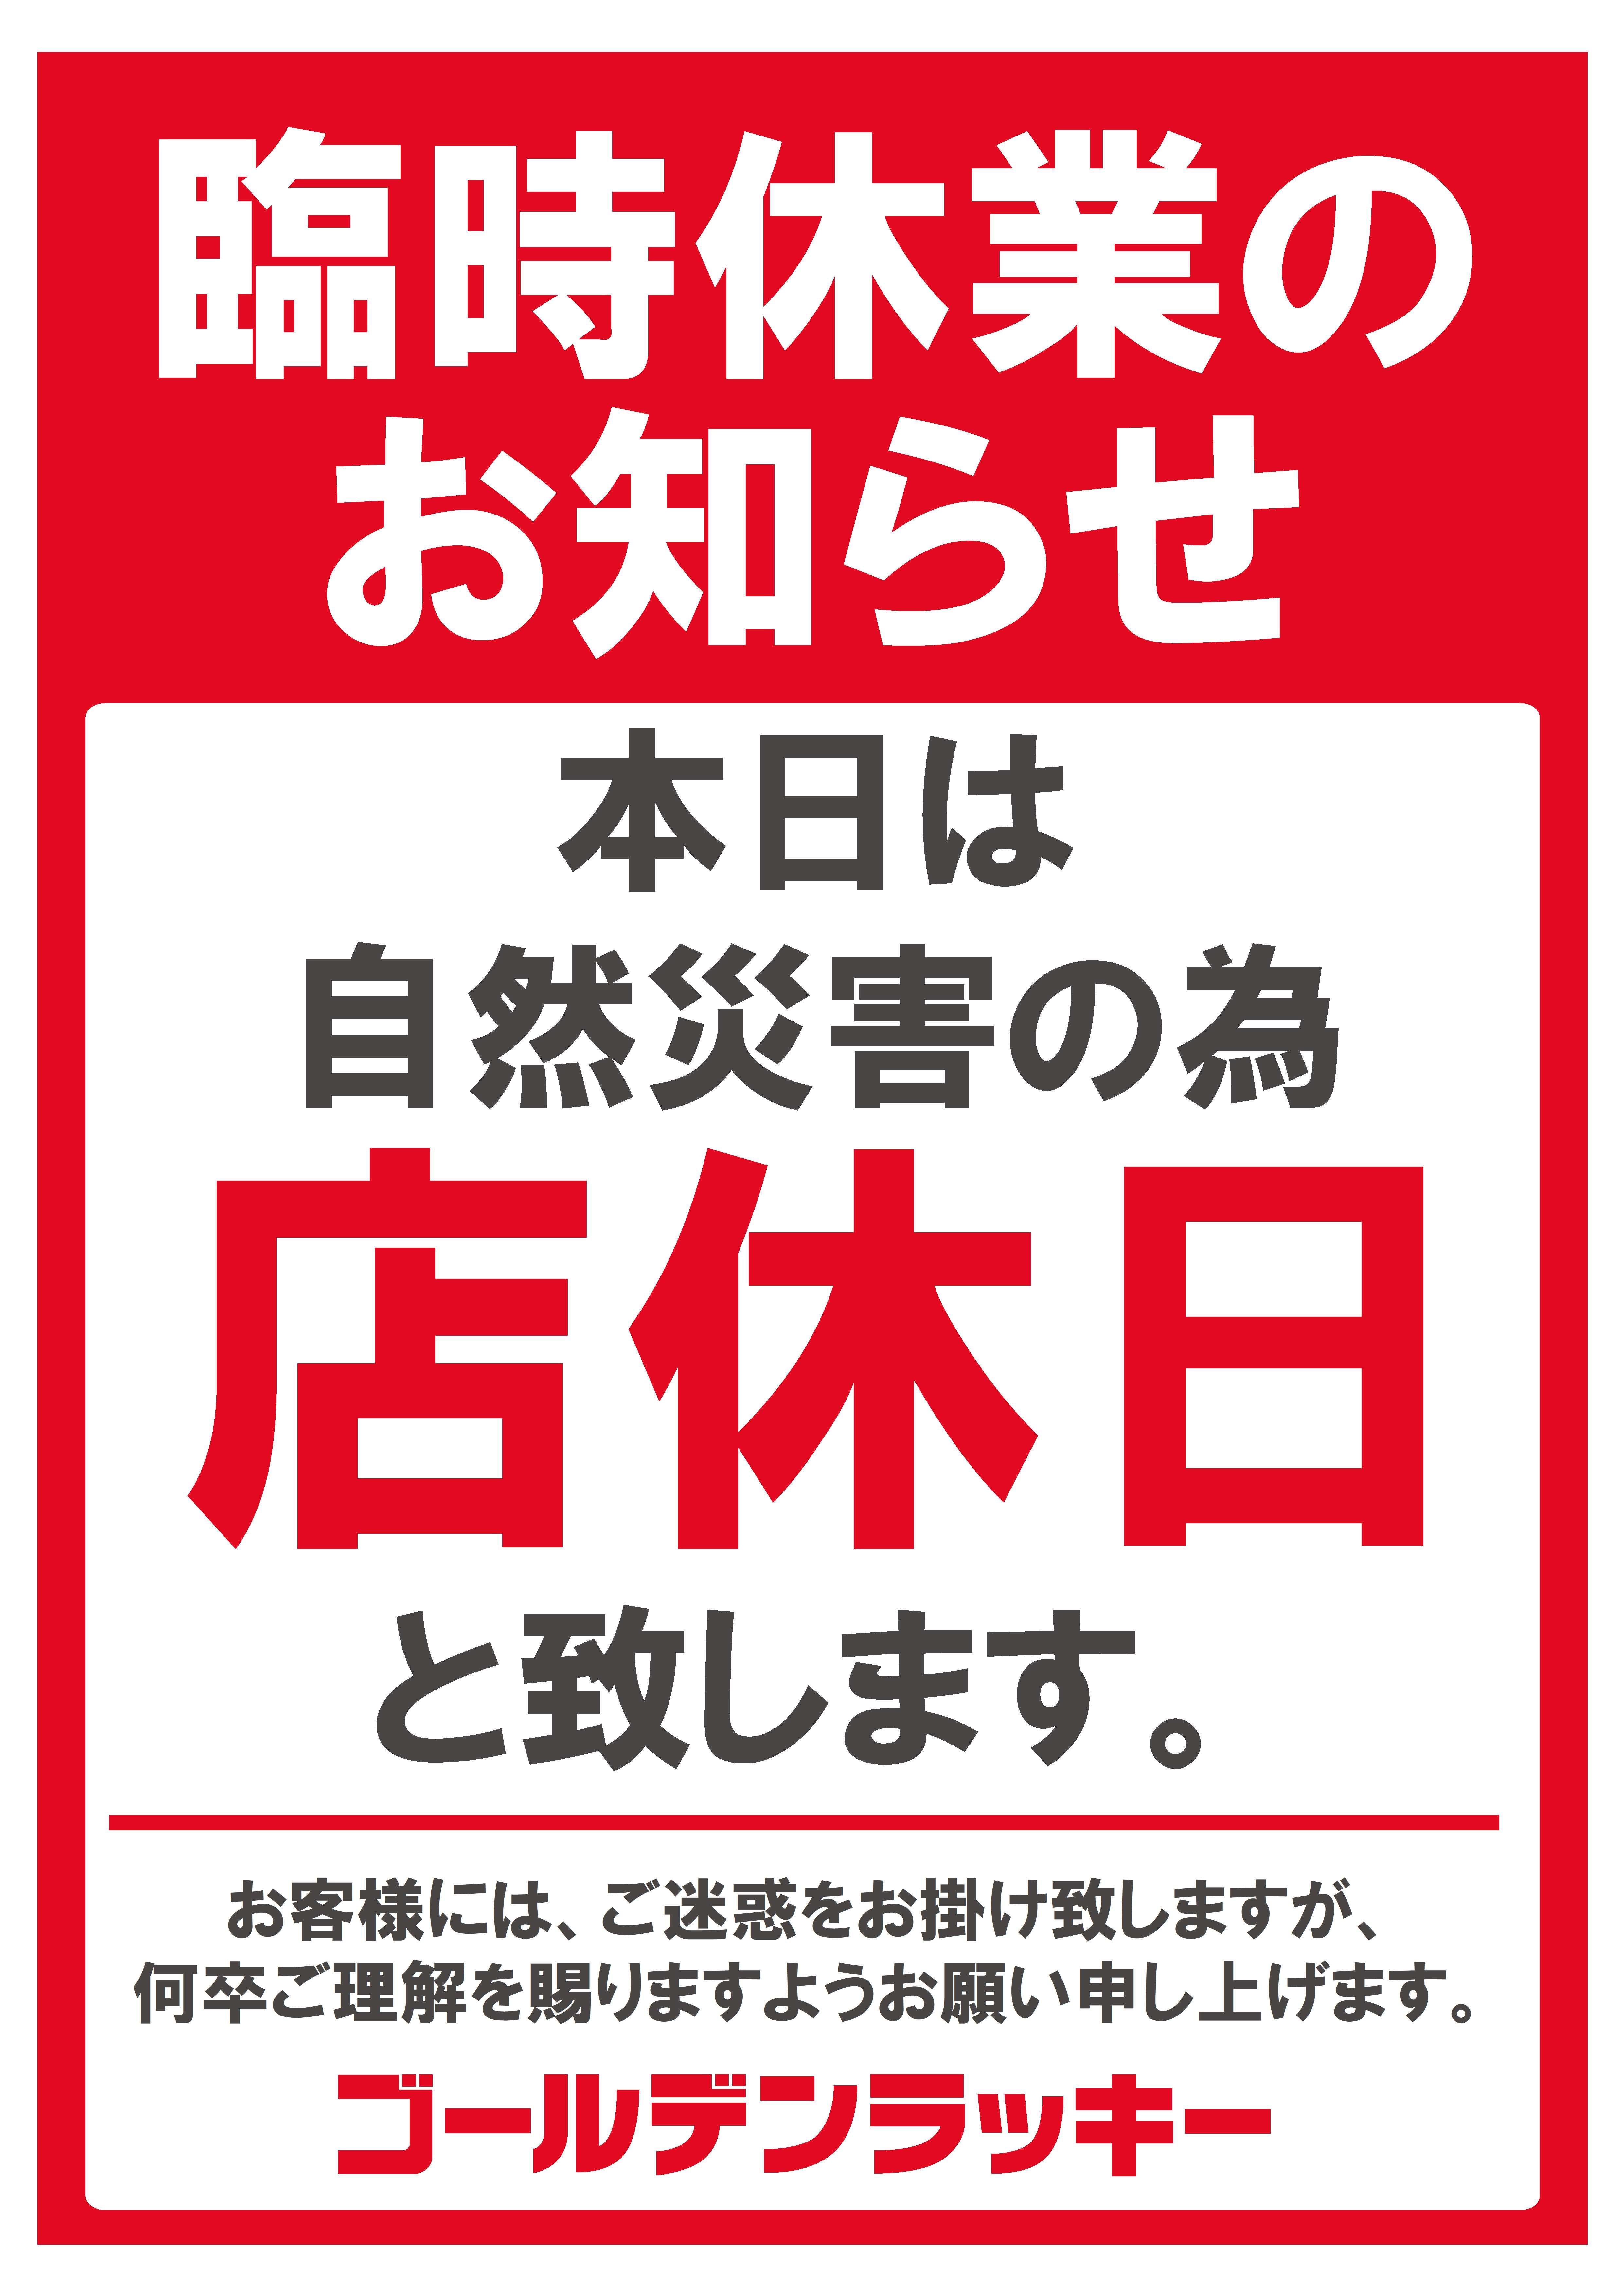 "<span class=""title"">臨時休業のお知らせ 武雄店、8/14(土)</span>"